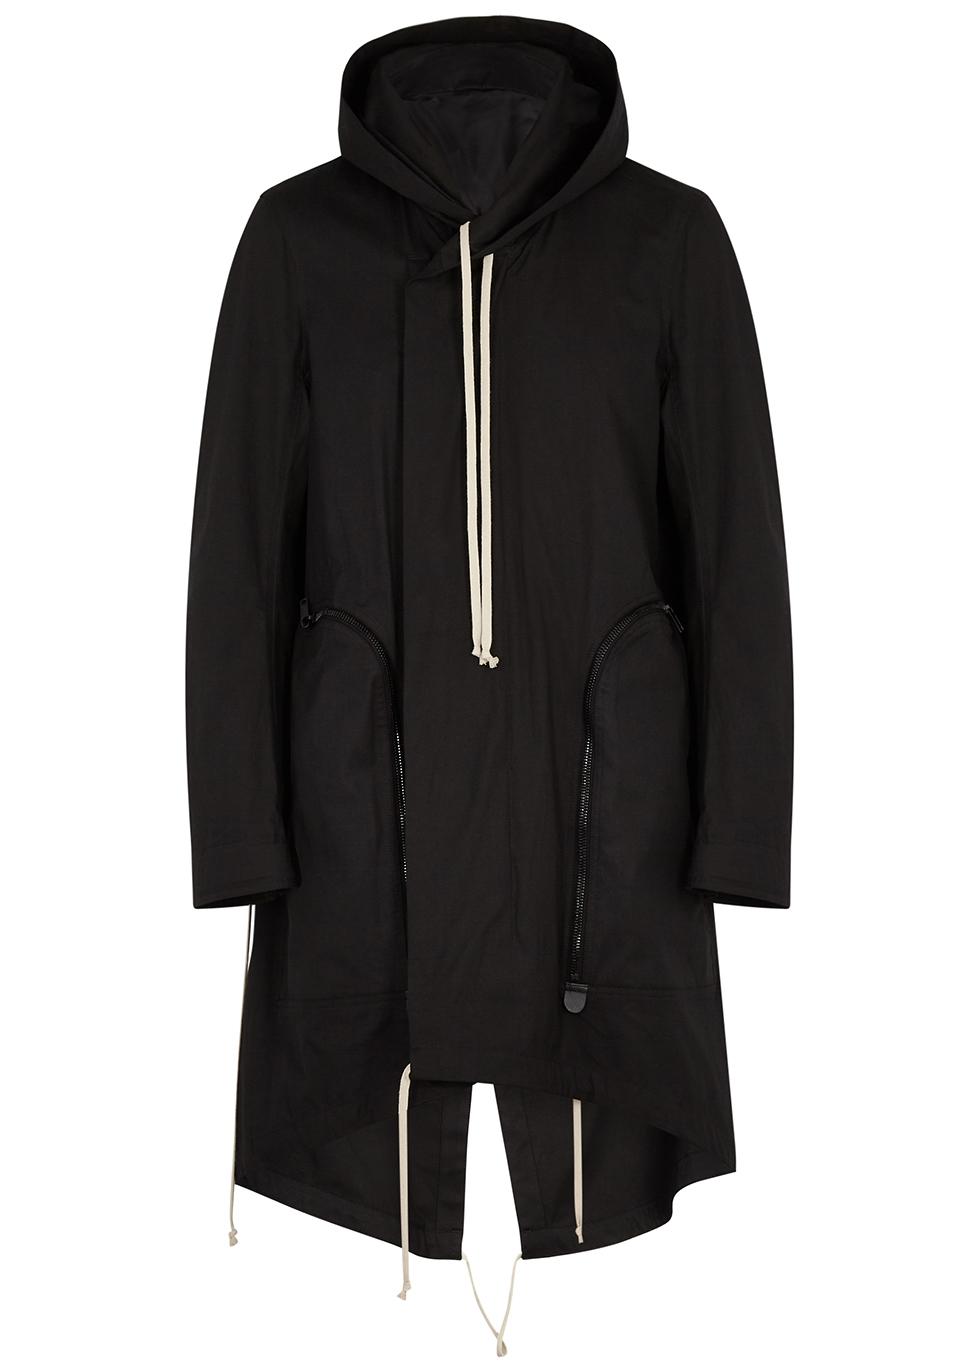 Black hooded stretch-cotton parka